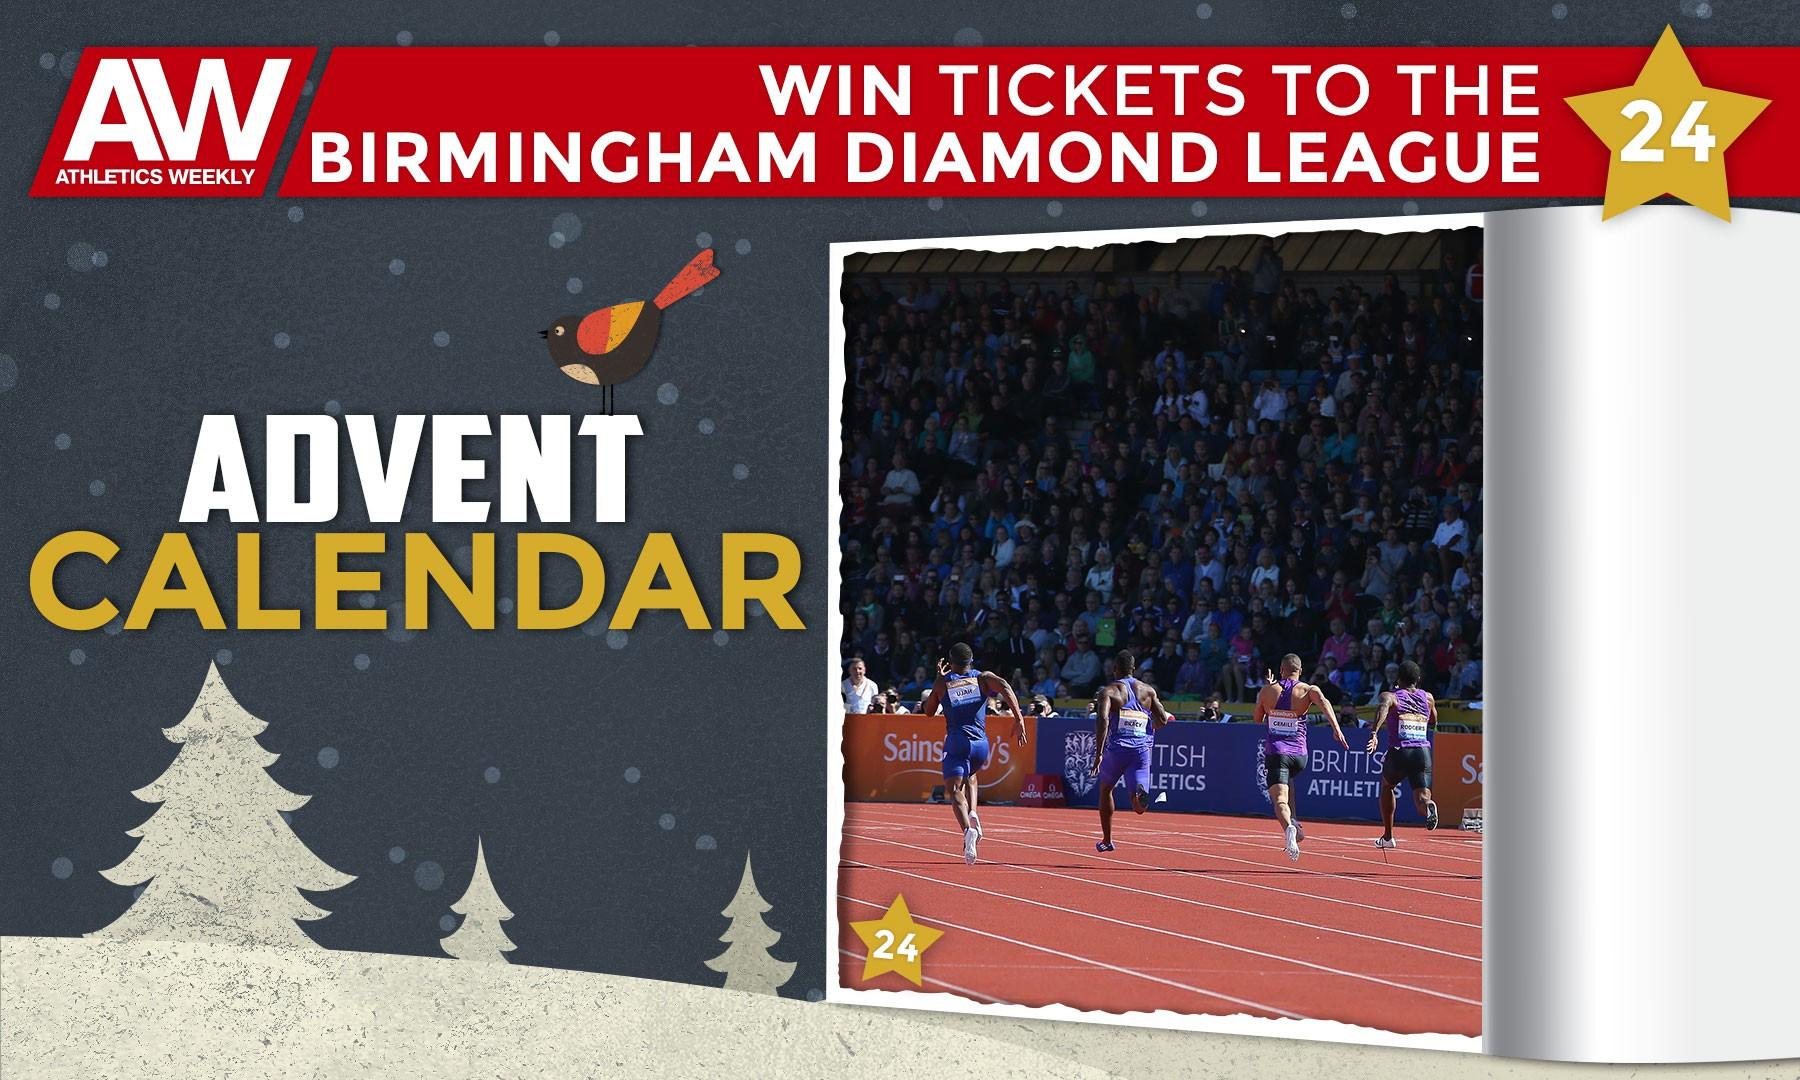 Win Birmingham Diamond League tickets